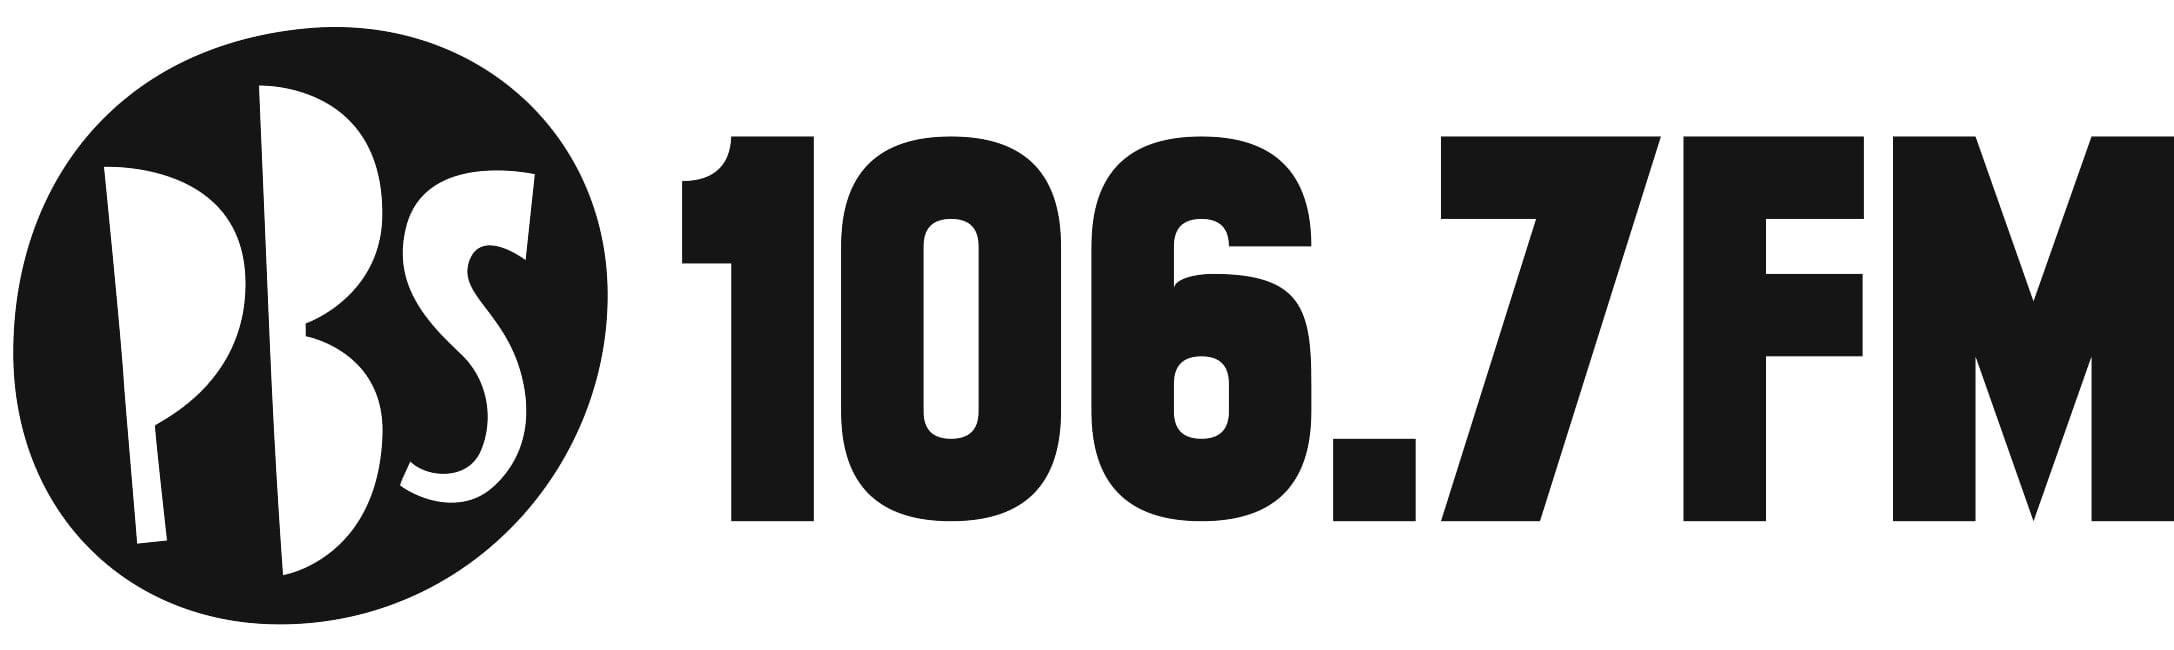 PBS logo gau25t